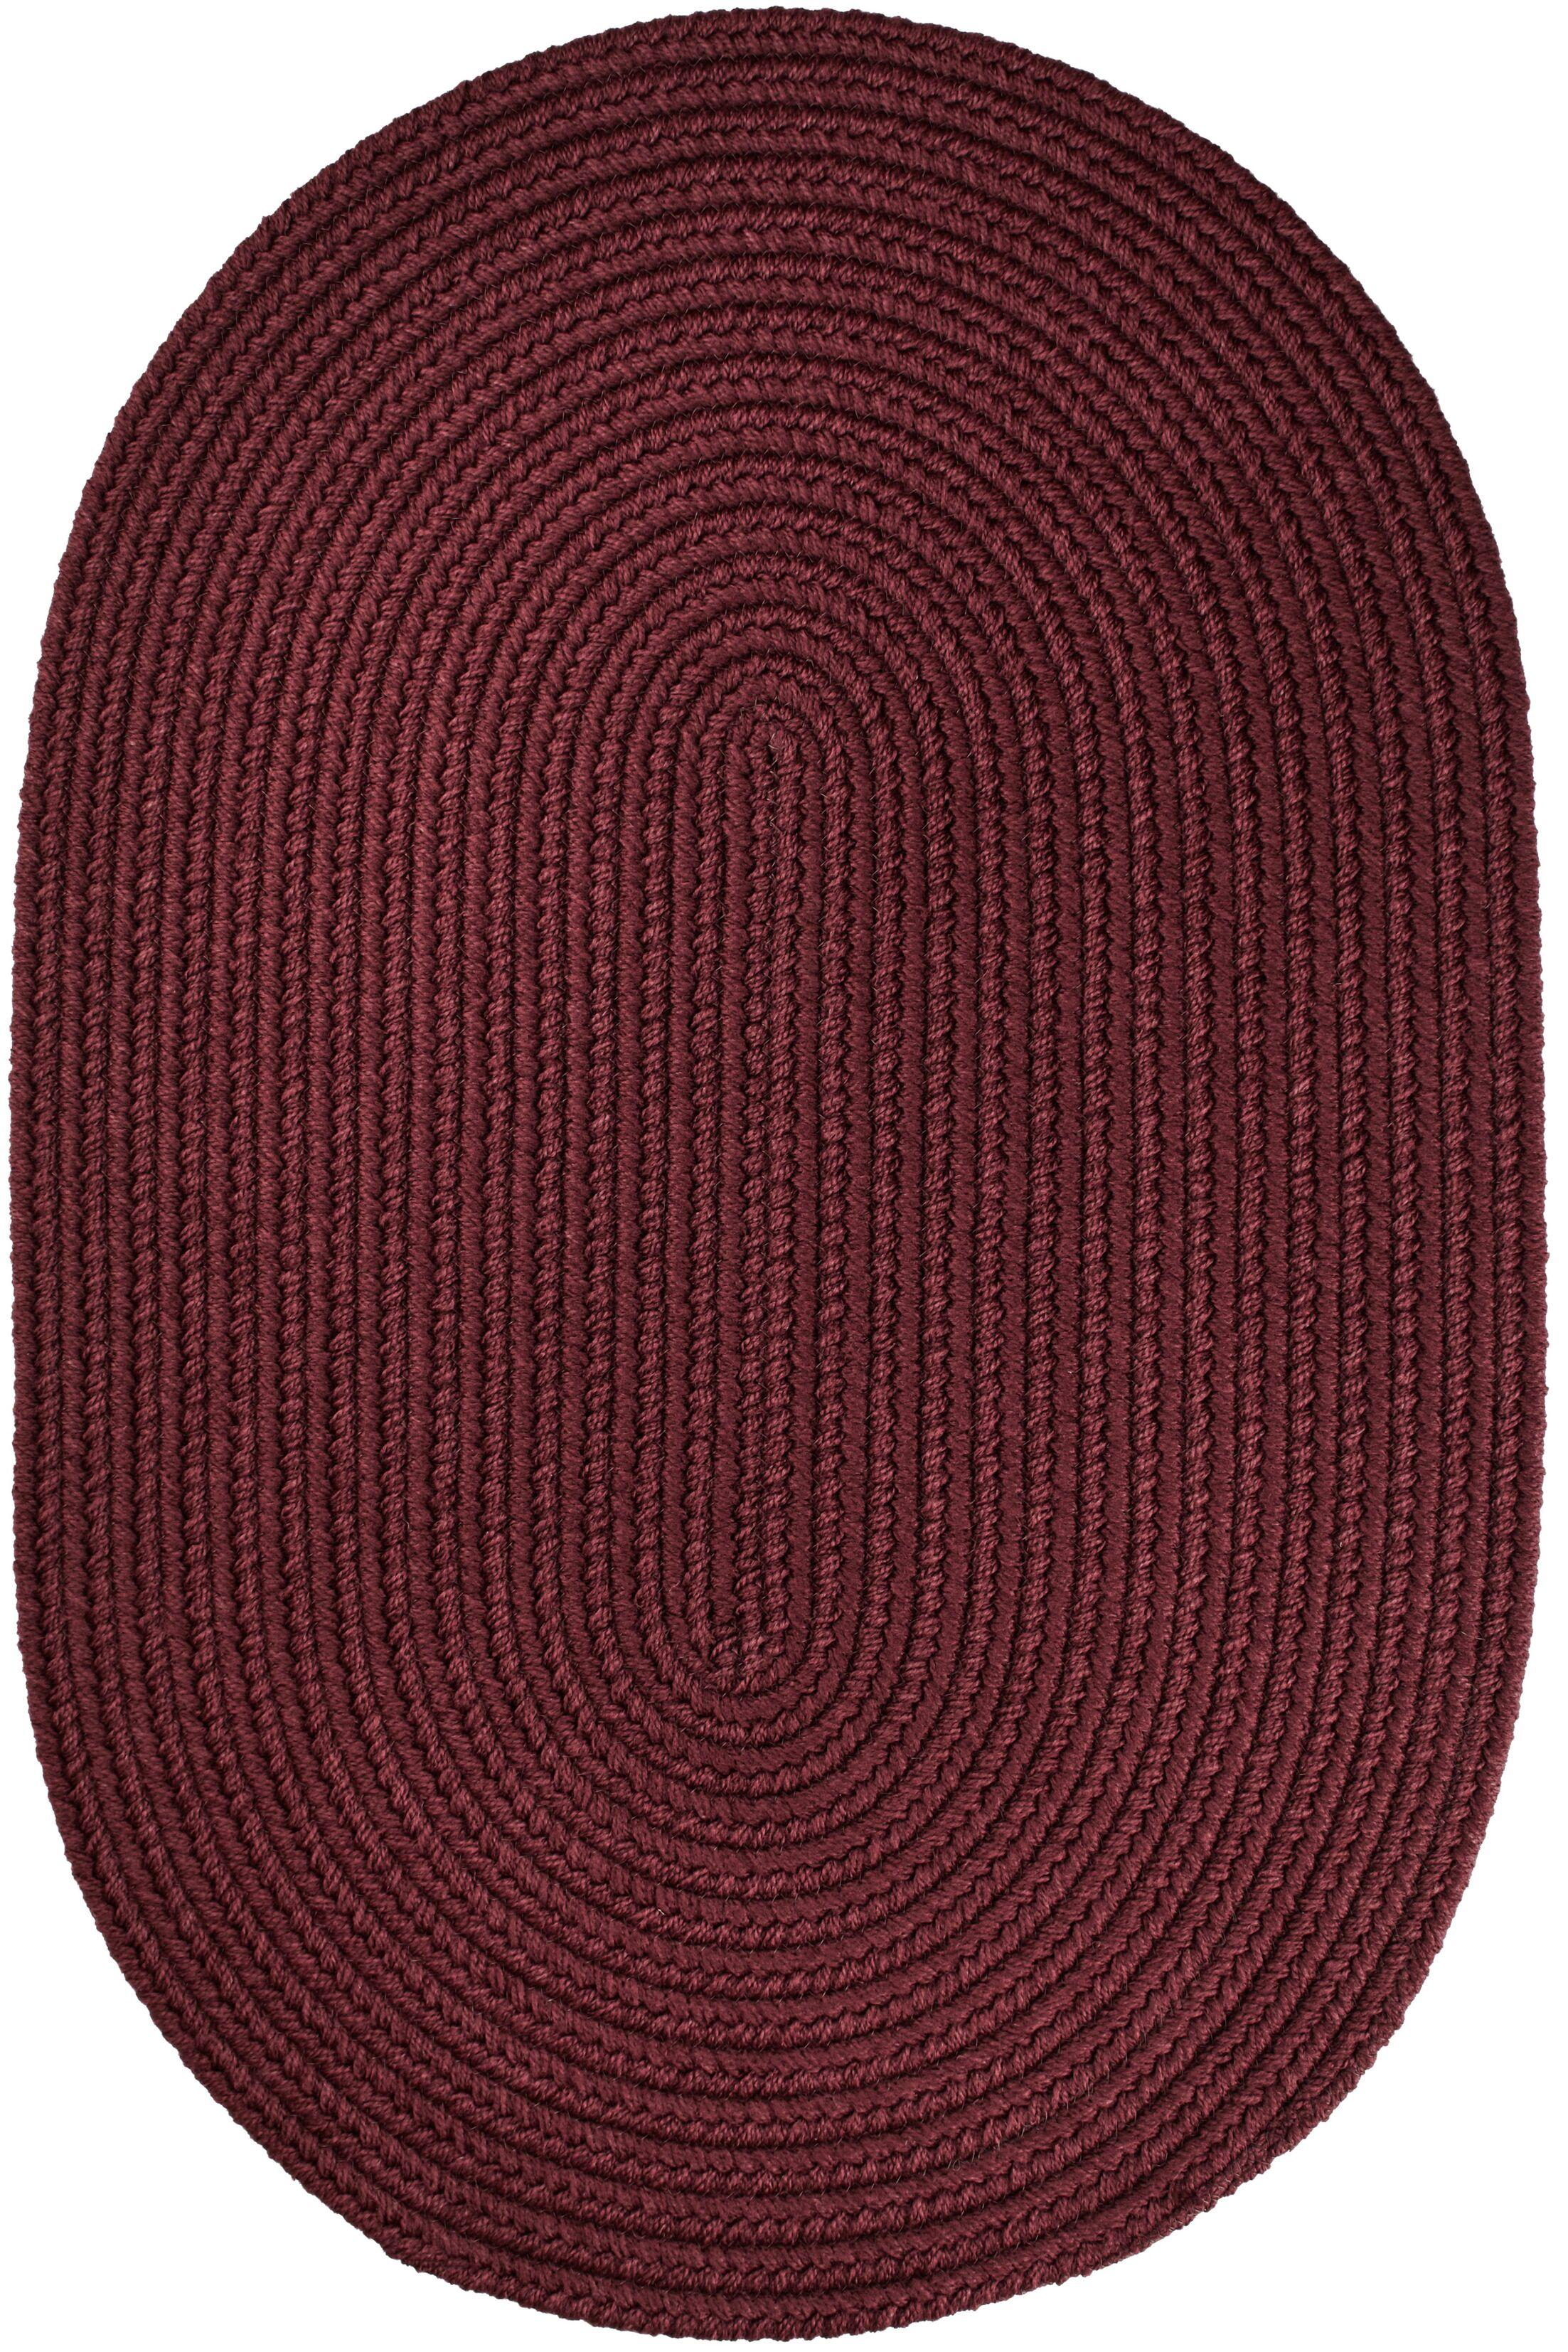 Handmade Burgundy Indoor/Outdoor Area Rug Rug Size: Oval 5' x 8'